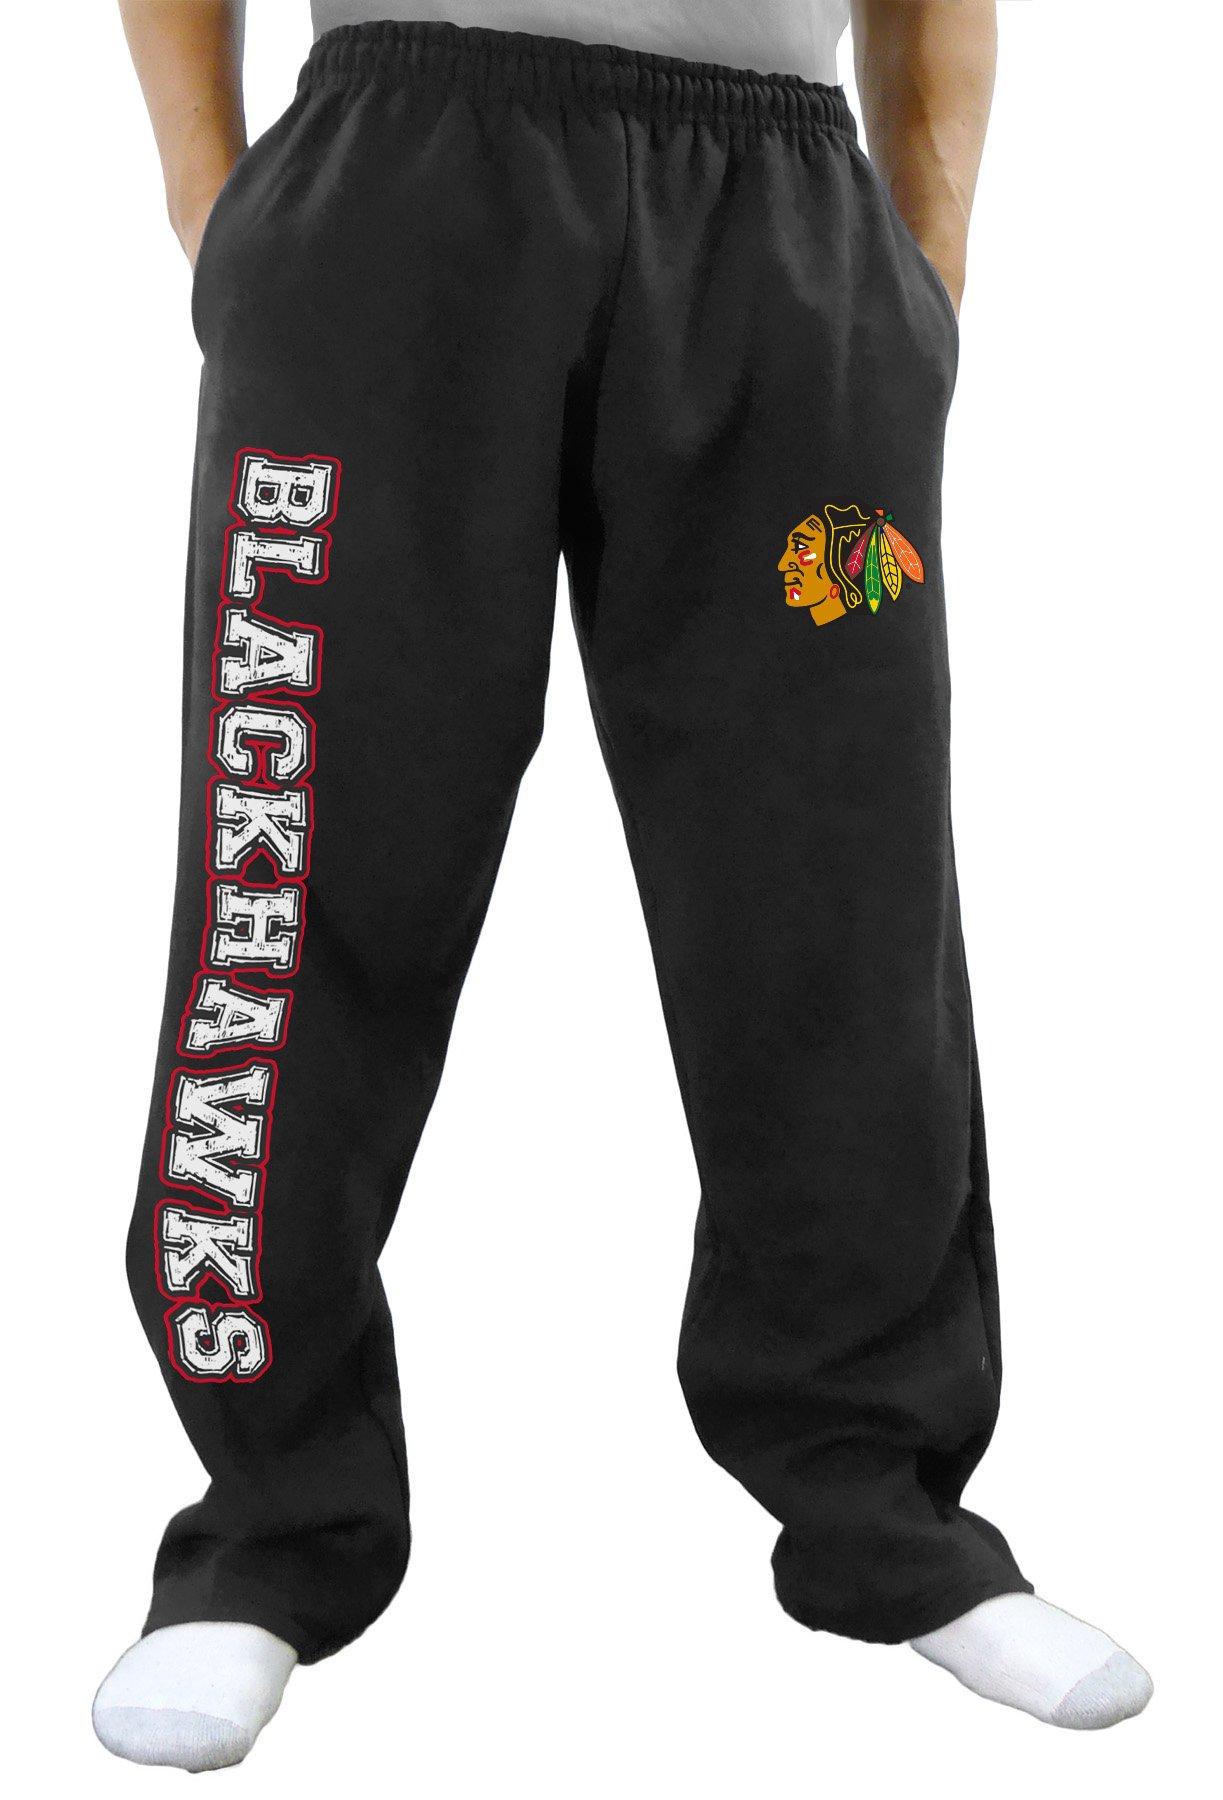 NHL Men's Premium Fleece Official Team Sweatpants (Chicago Blackhawks, Small)